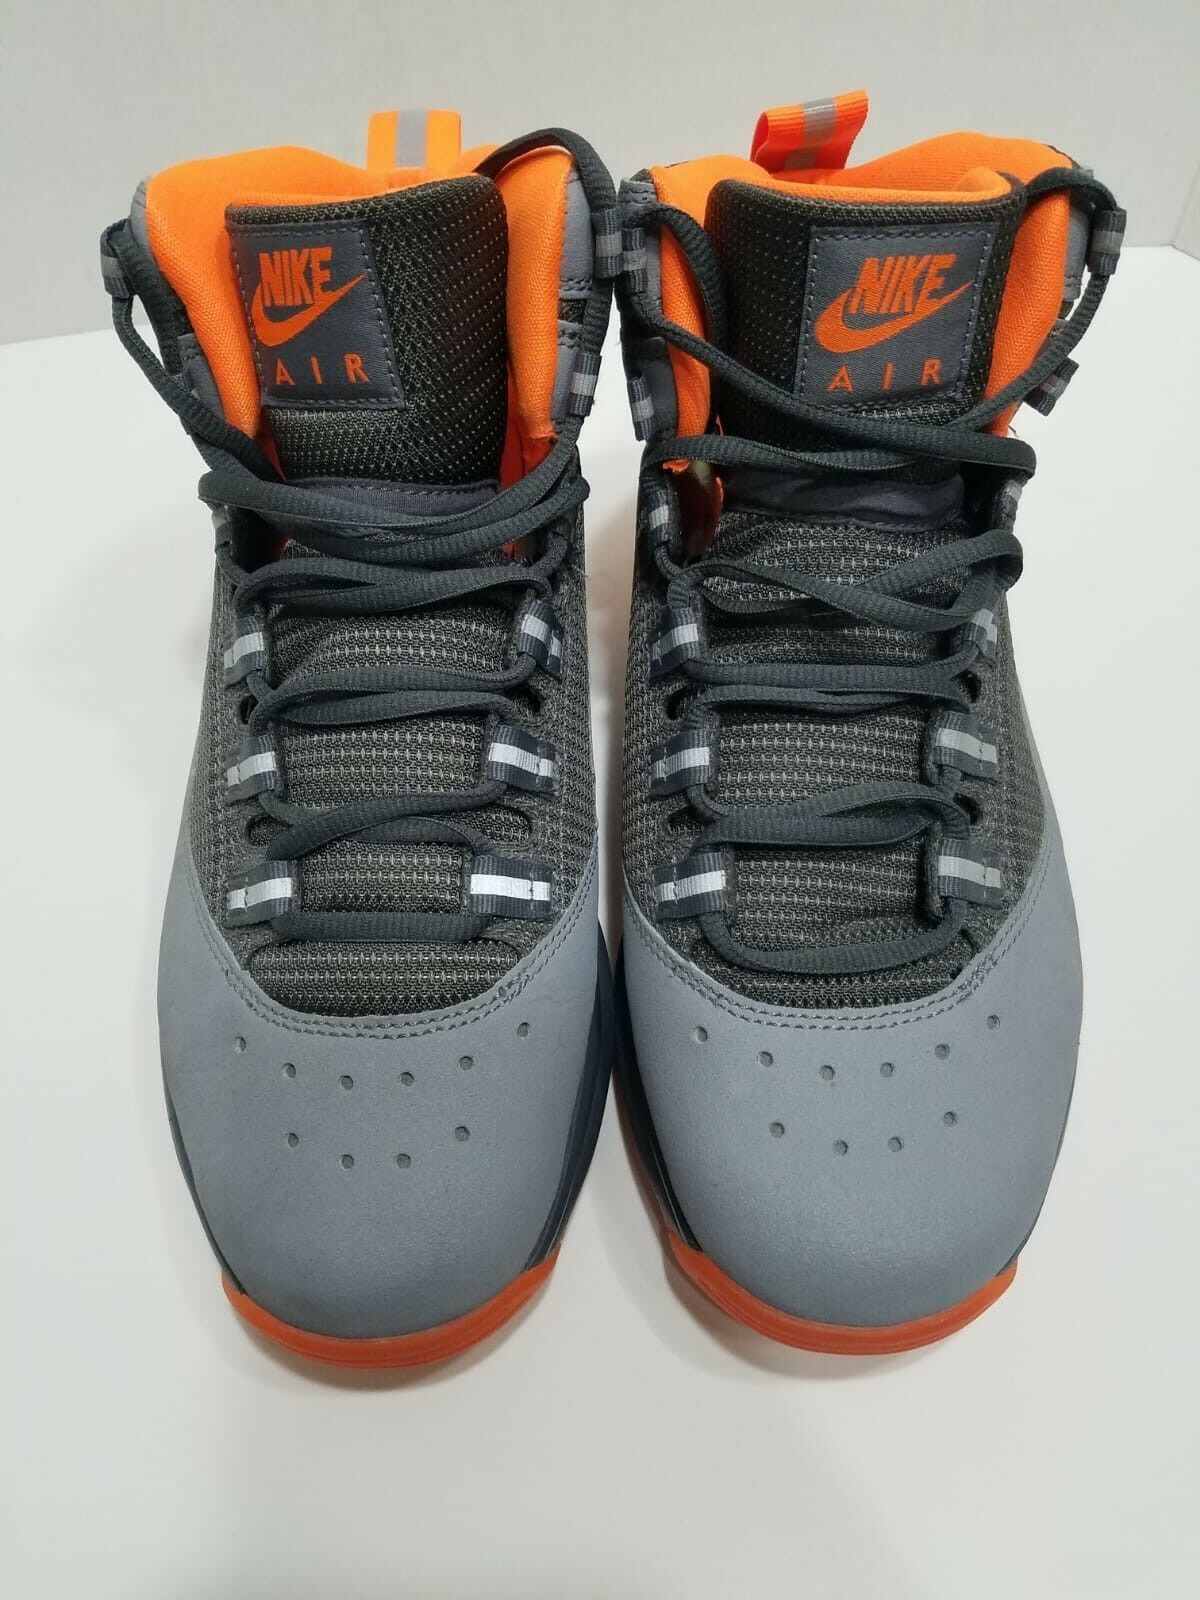 NIKE AIR MAX DARWIN 360 RODMAN Stealth Orange Grey (511492-018)  basketball sz 9